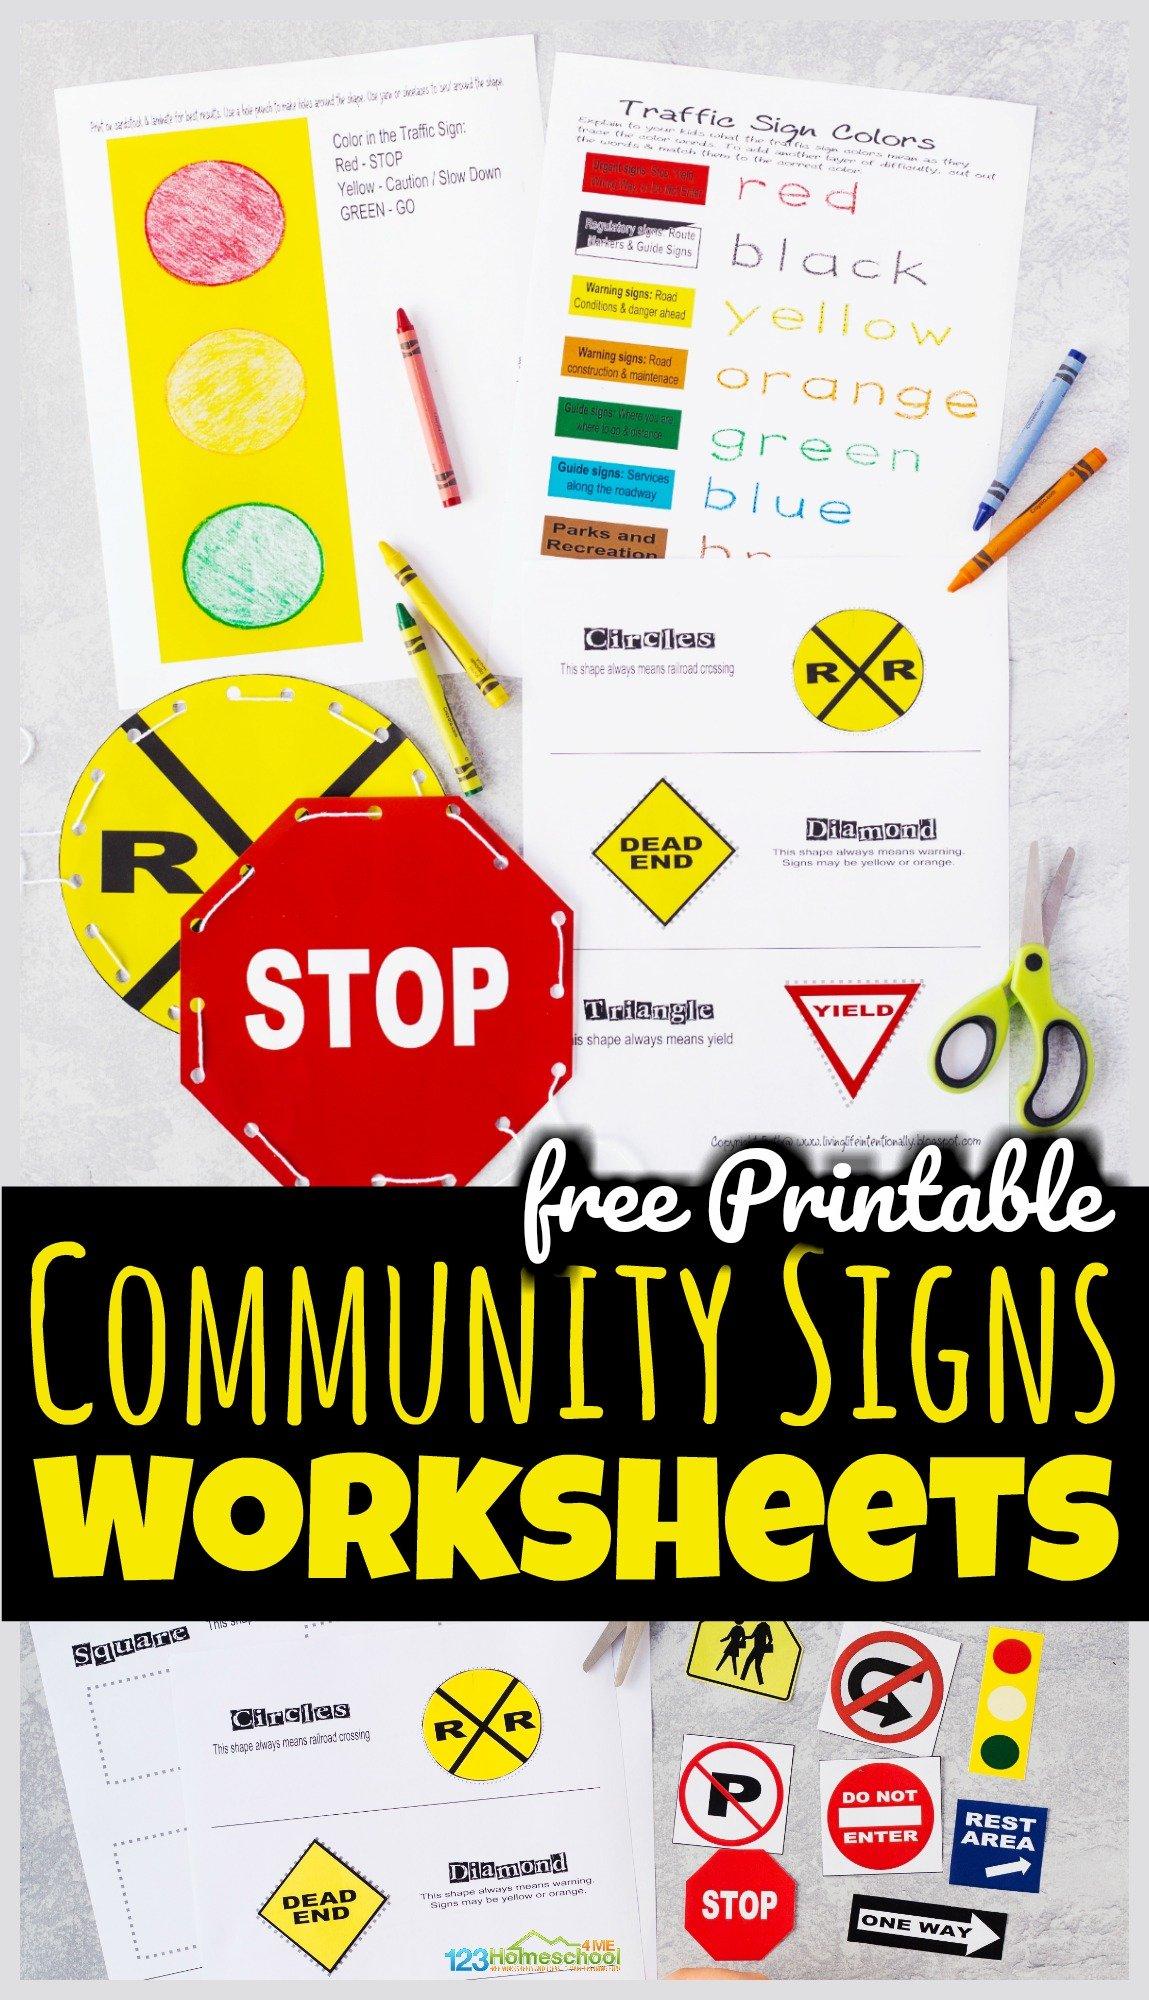 Free Printable Community Signs Worksheets